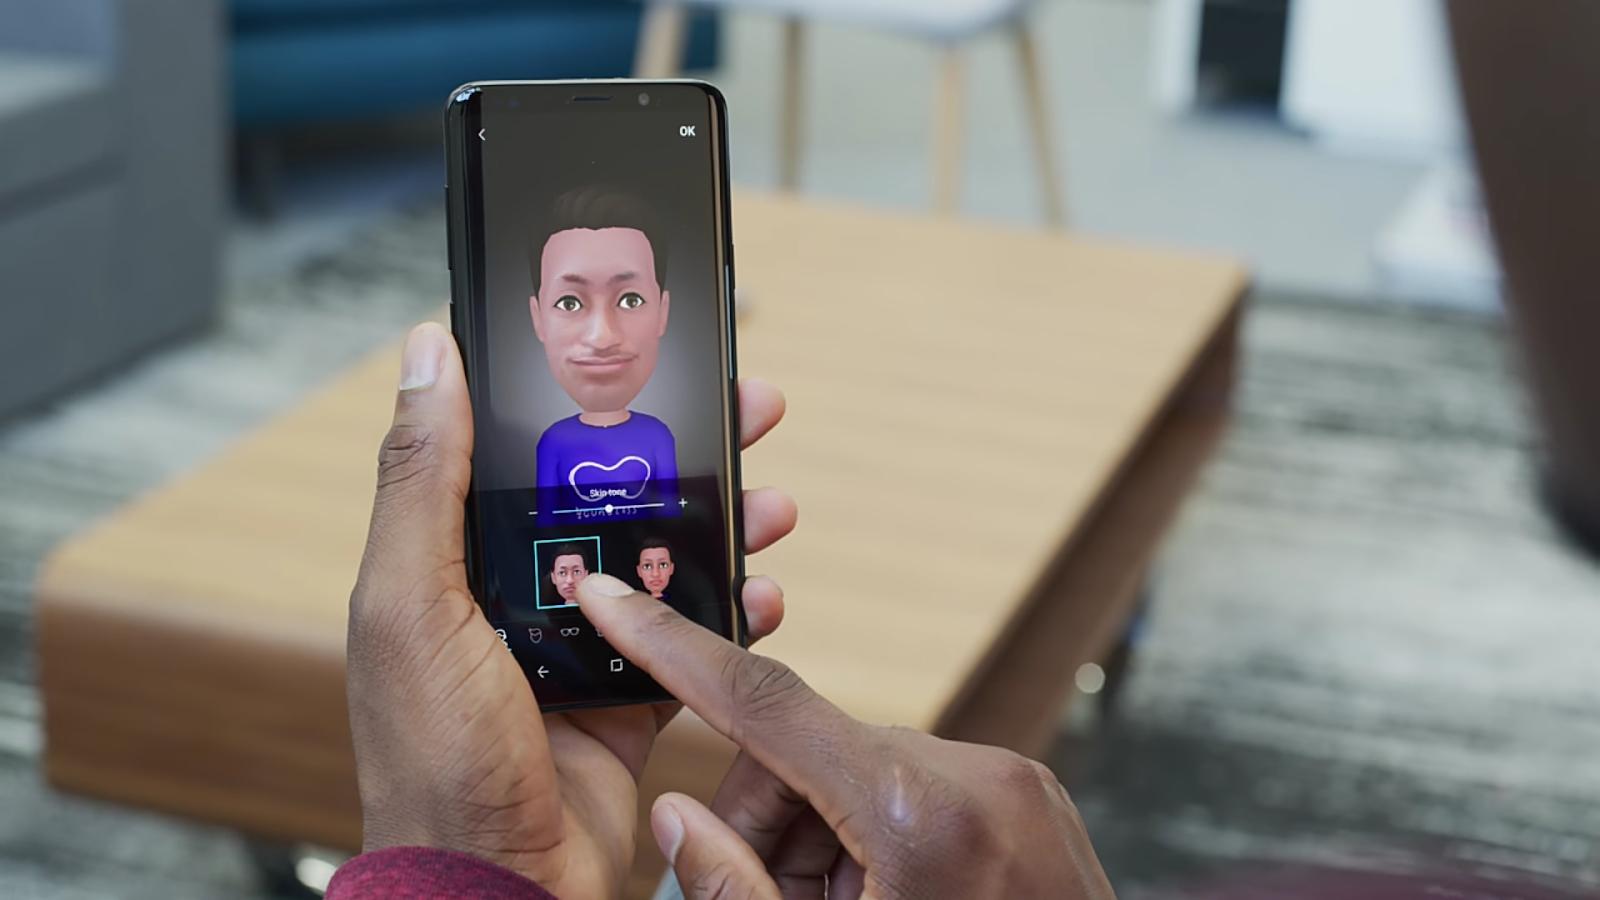 A second photo of the AR Emoji